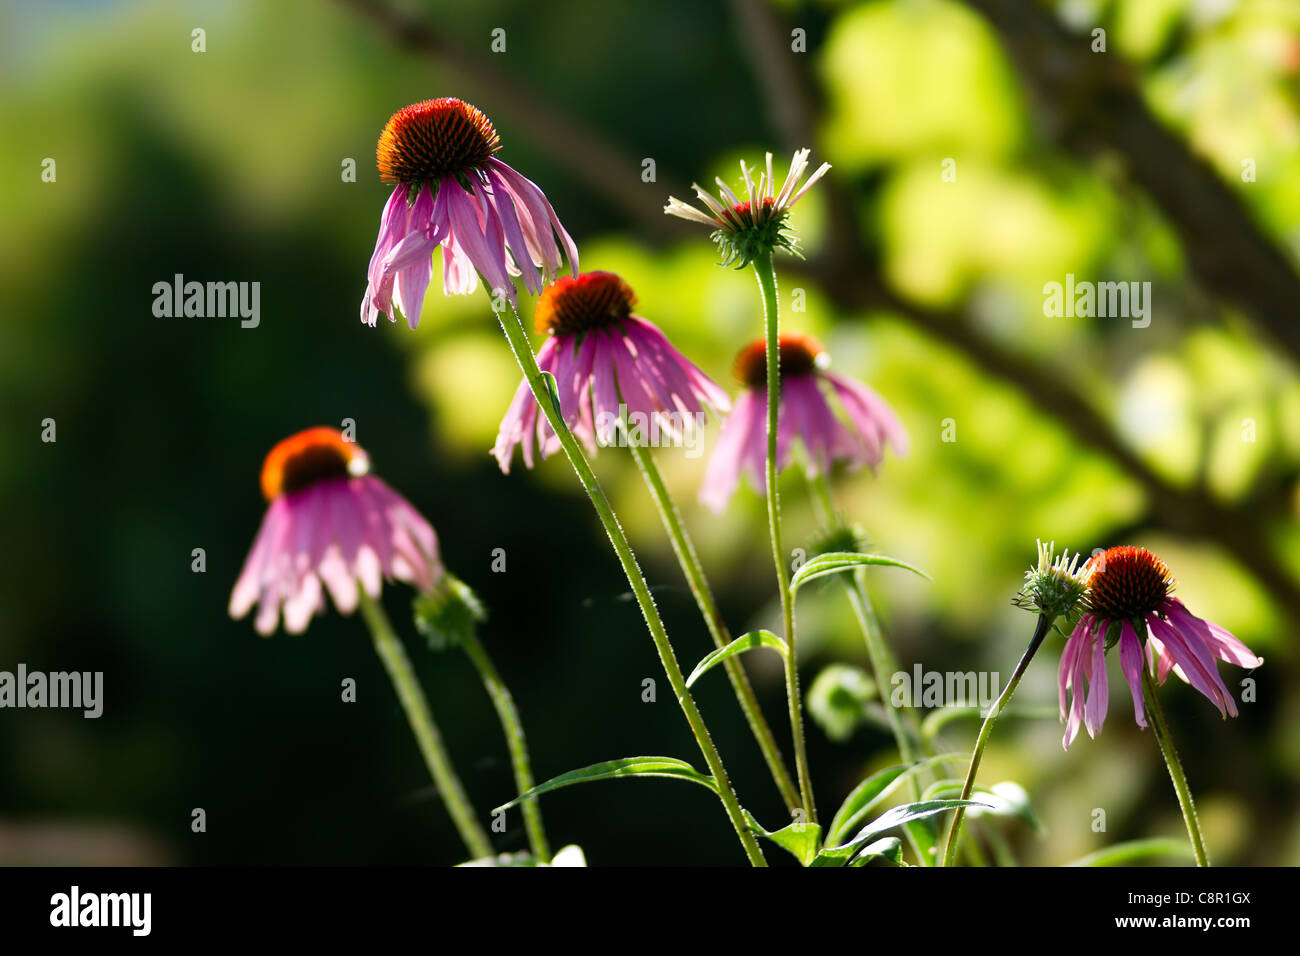 Echinacea purpurea, or Eastern purple coneflower - Stock Image